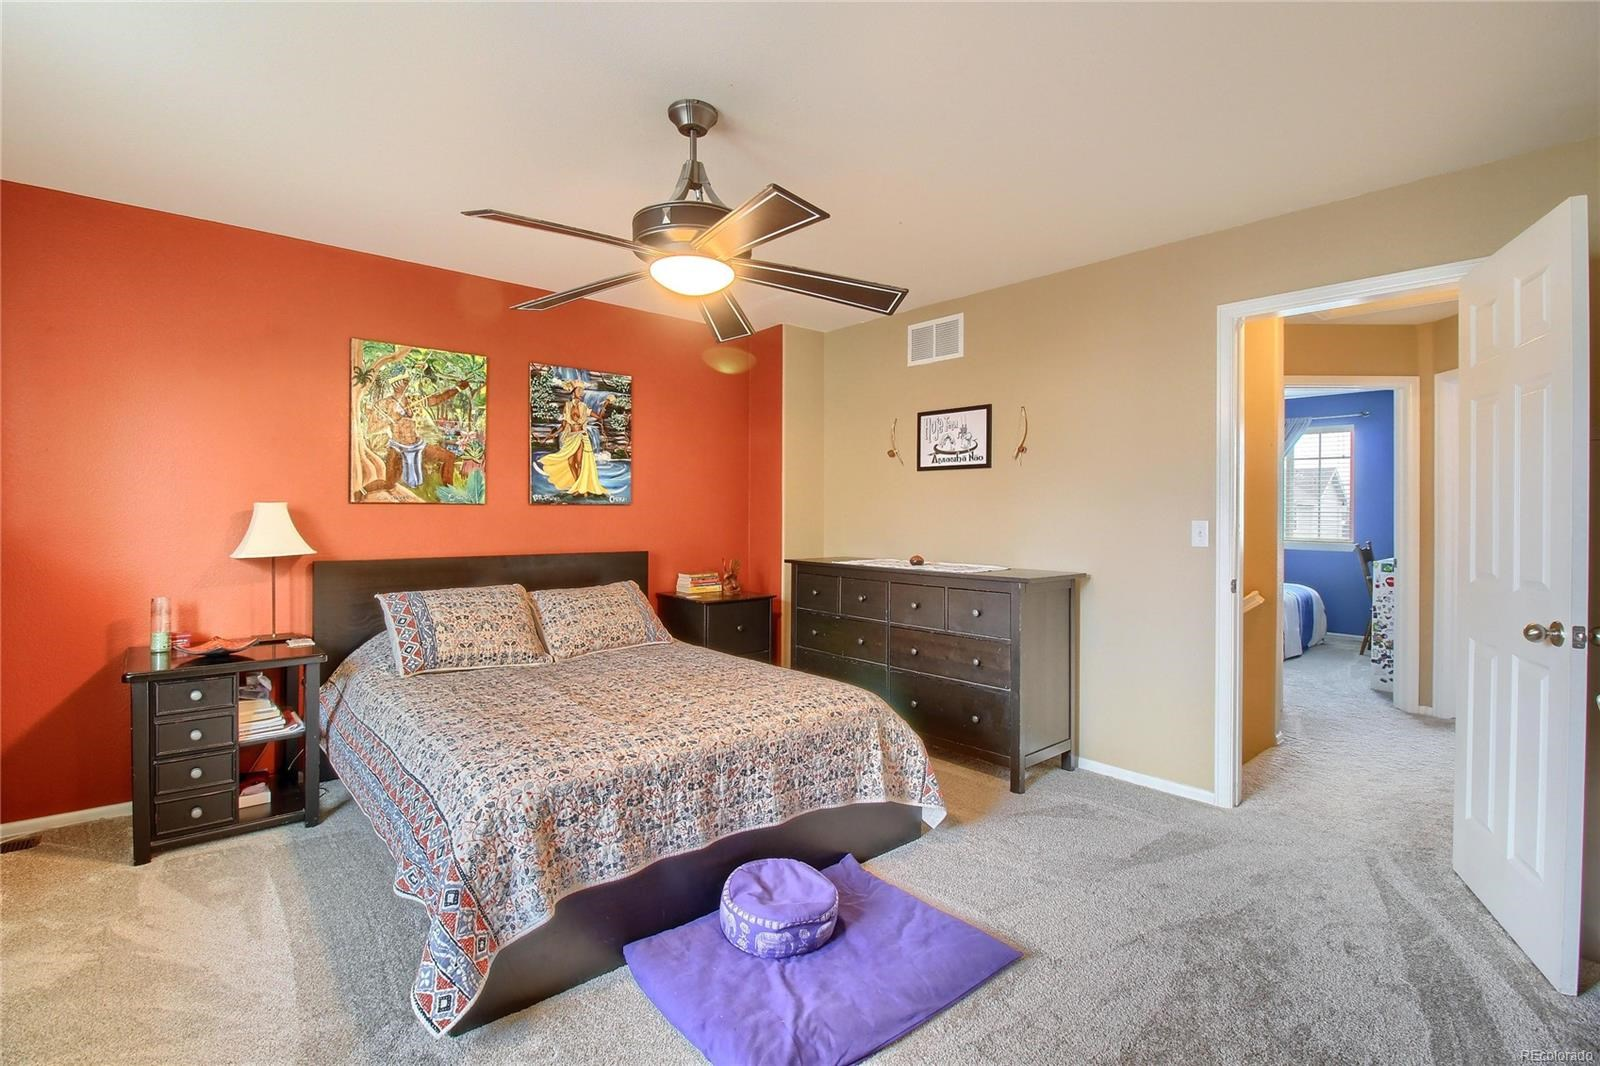 MLS# 3607545 - 20 - 5604 Mount Sanitas Avenue, Longmont, CO 80503